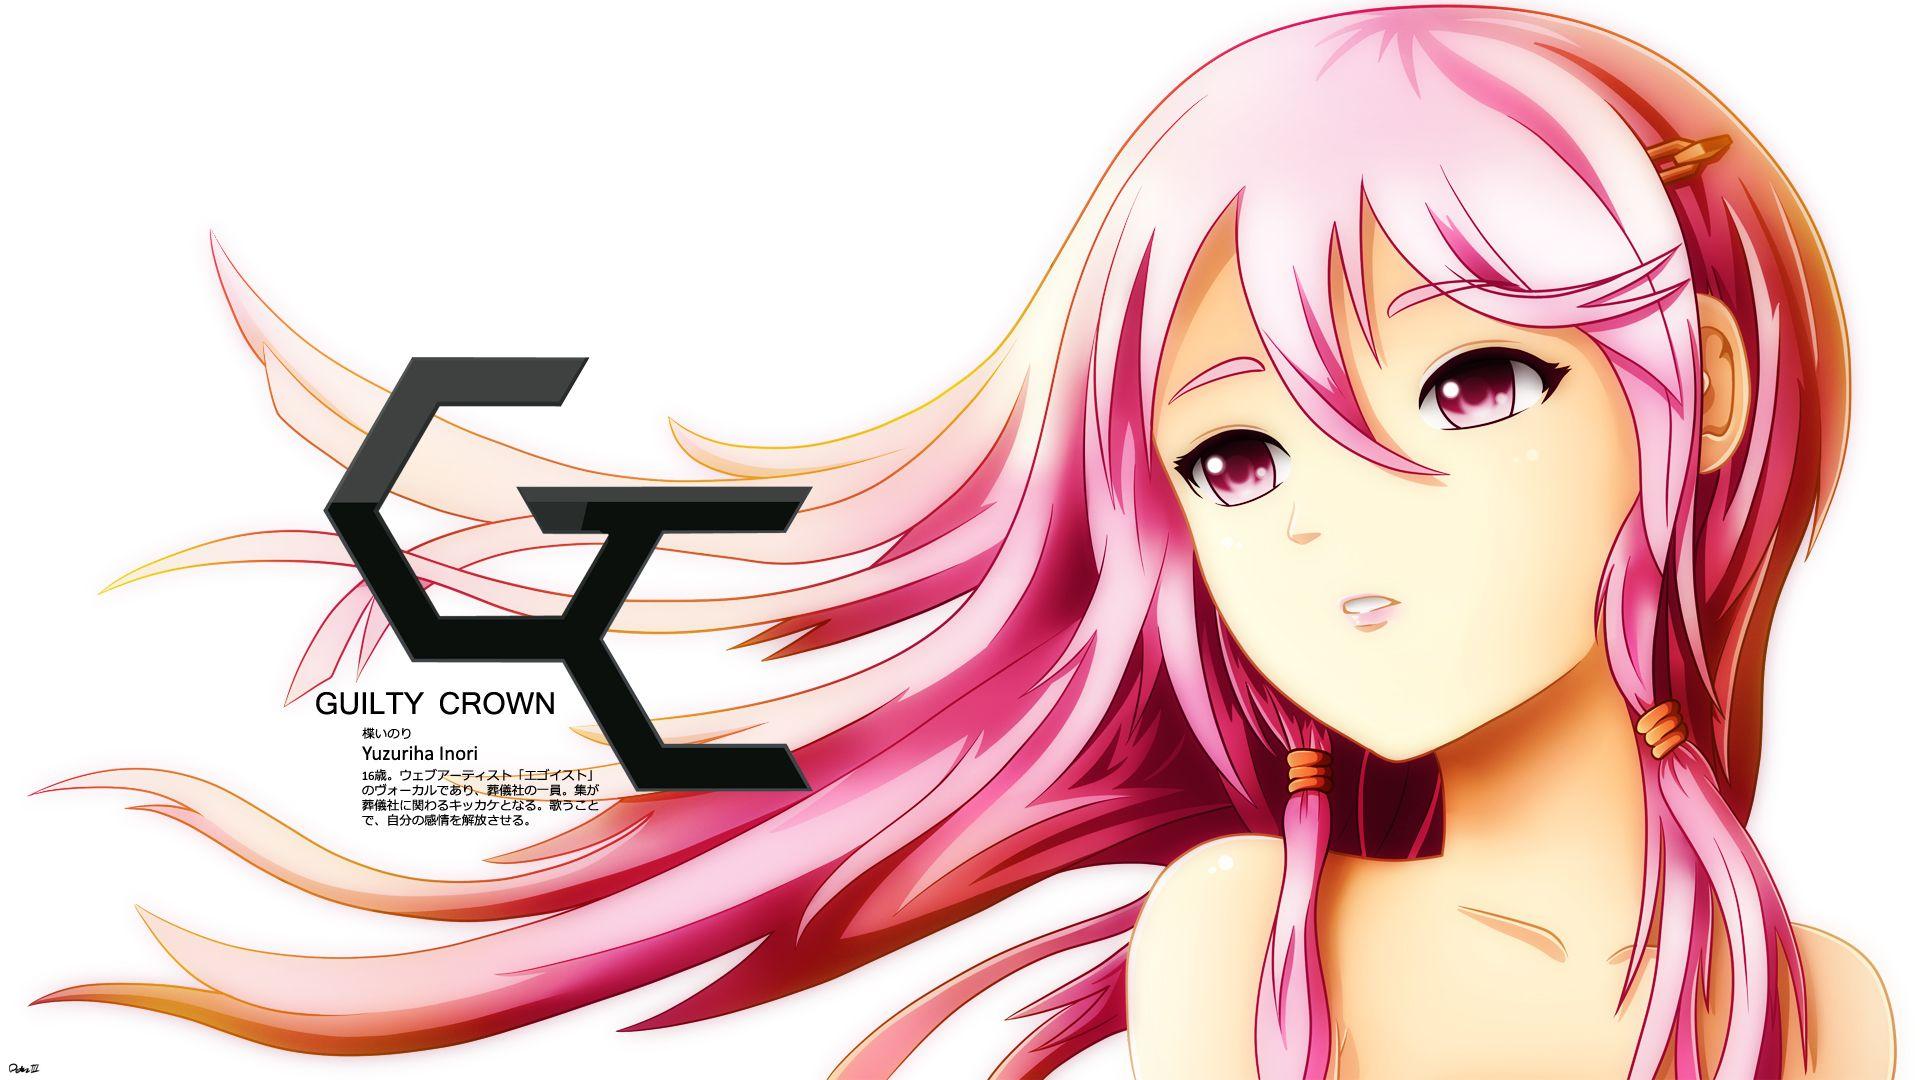 Inori Guilty Crown 美術家 ギルティクラウン アニメ